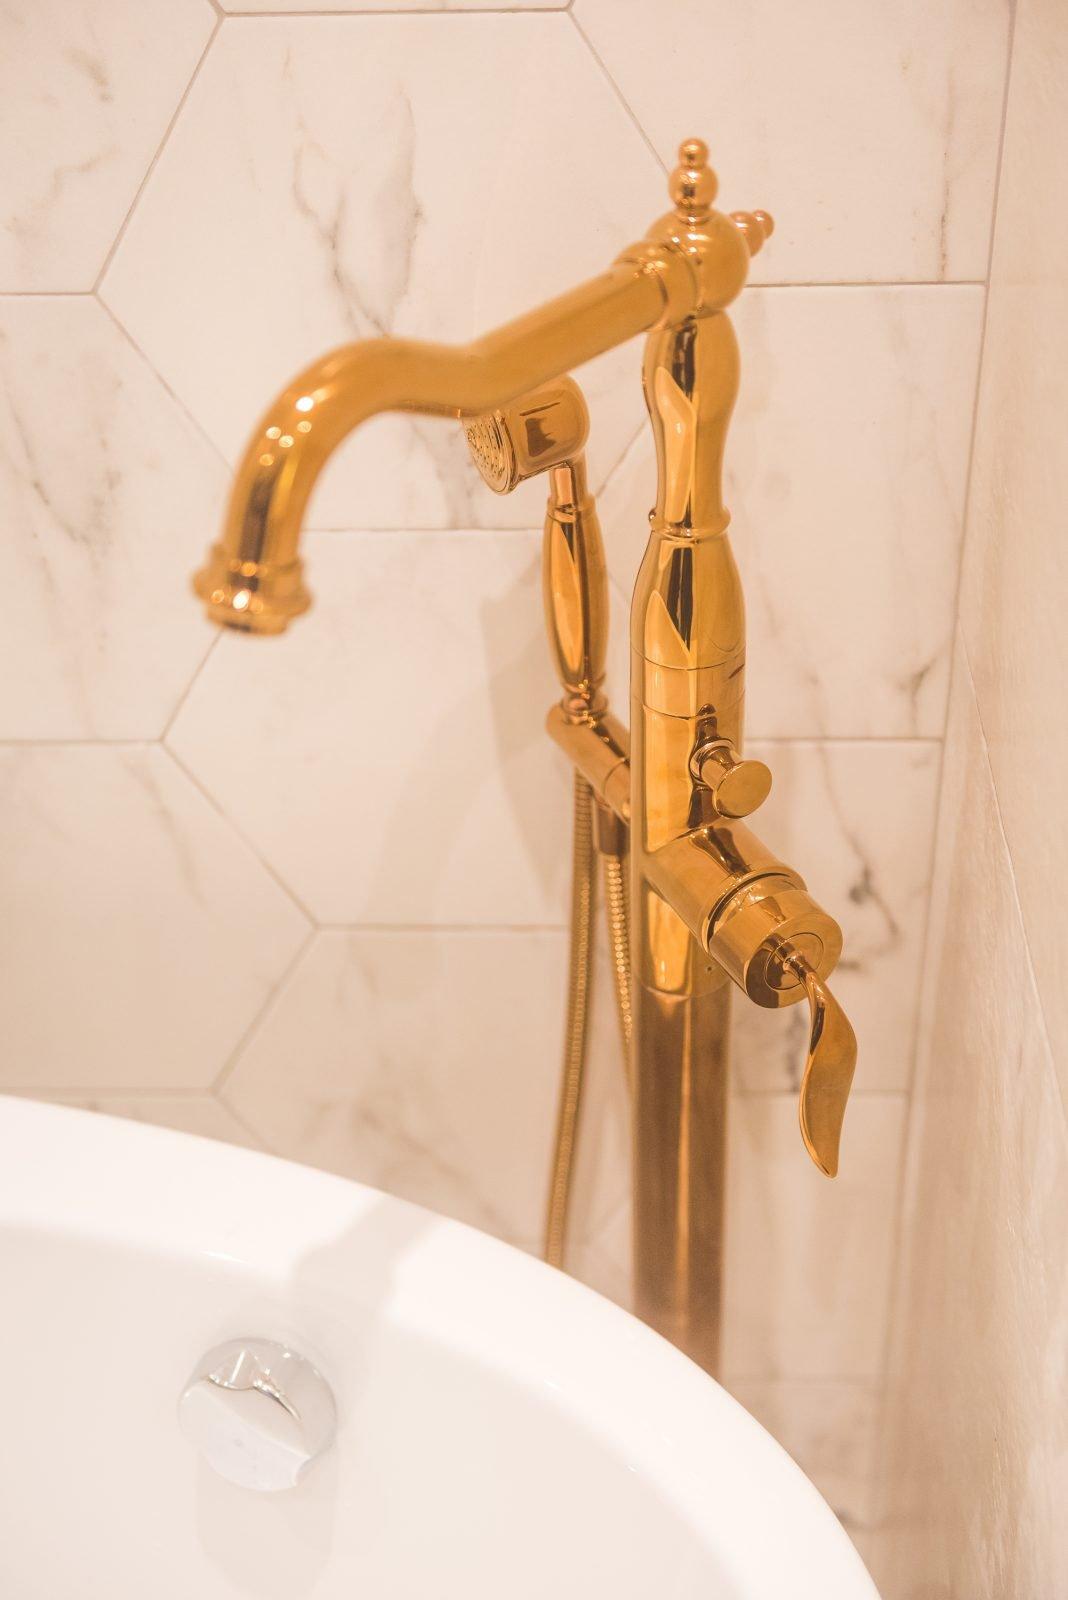 BP66 - Parisio Bath floor standing tap